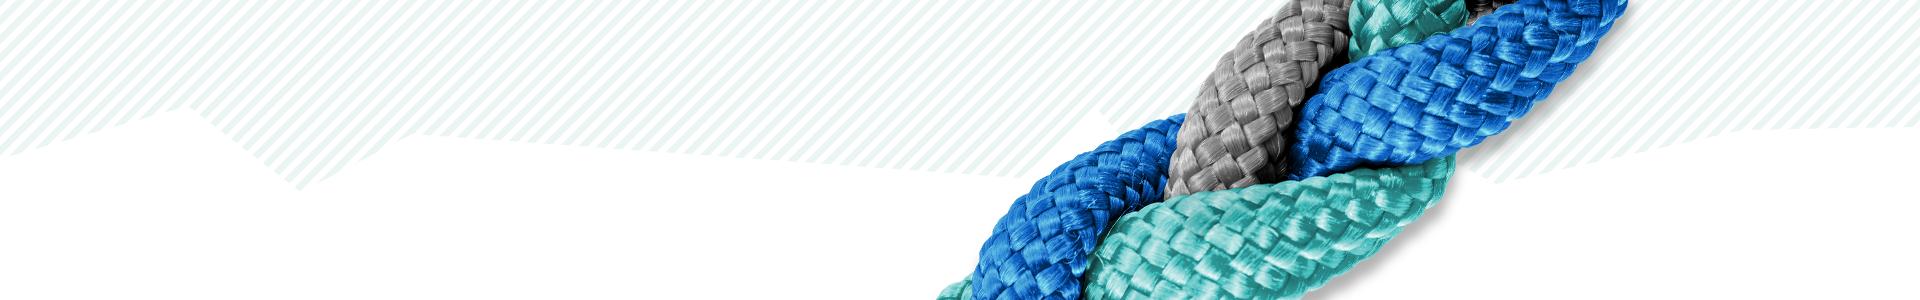 Schmietex GmbH: Textile Zugmittel